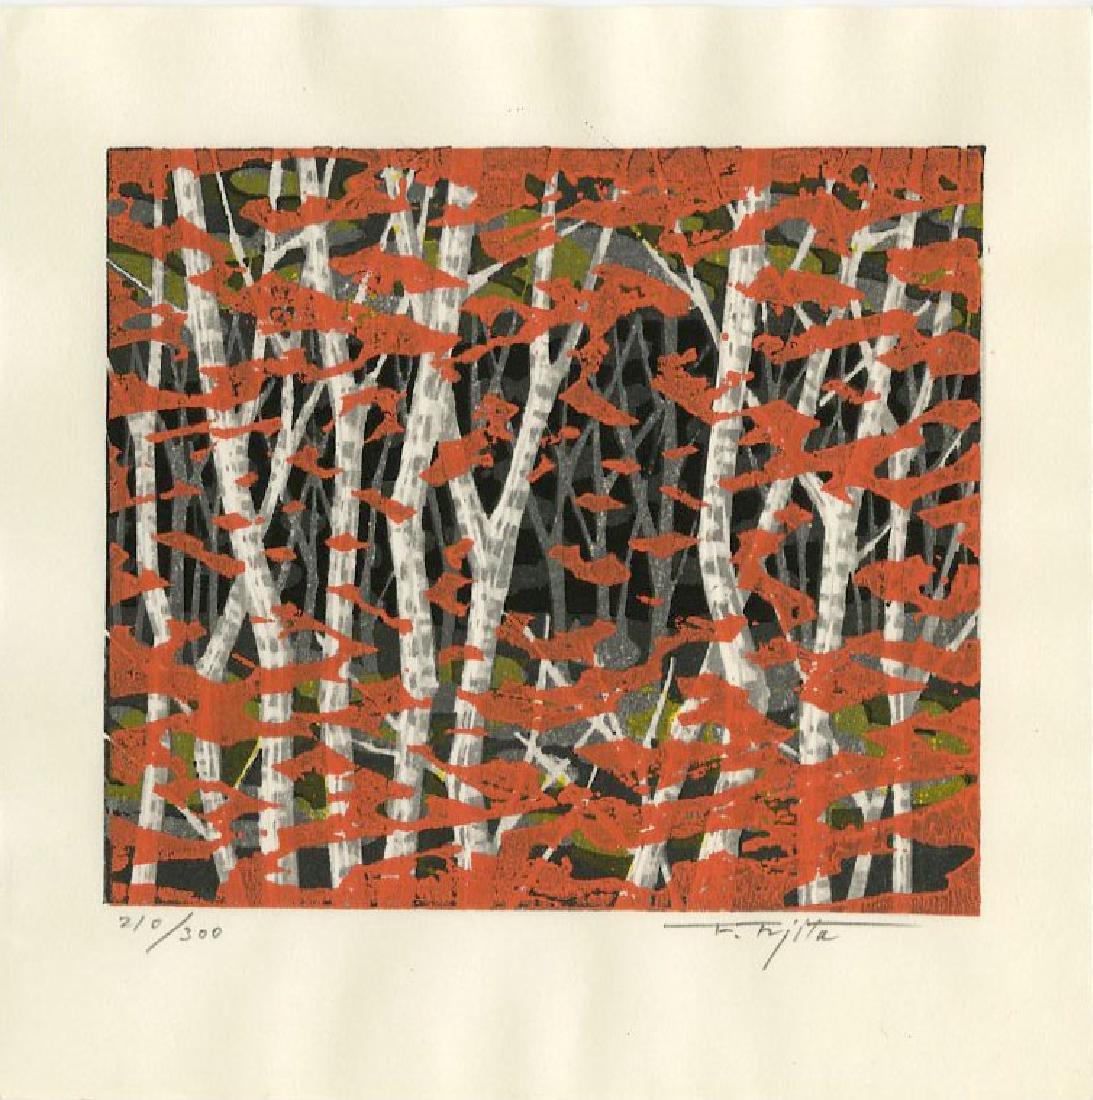 Fujita Fumio: Autumn woodblock 1st Ed. 1990